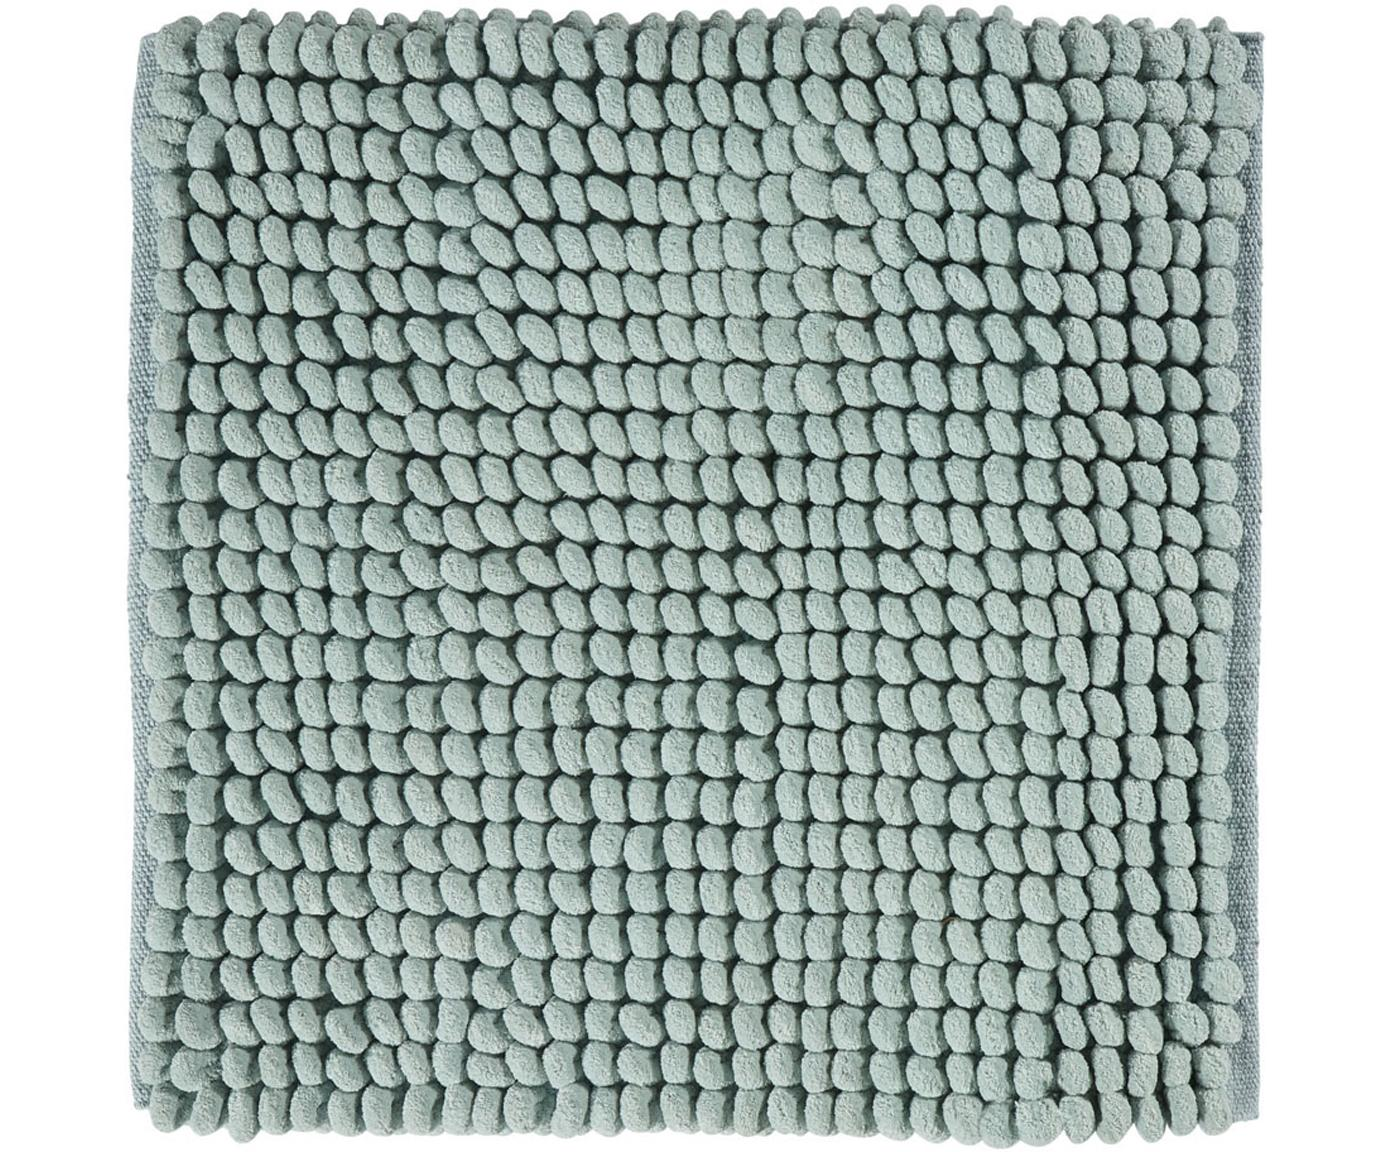 Zacht badmat Luka, 67% polyester, 33% katoen, Lichtgroen, 60 x 60 cm